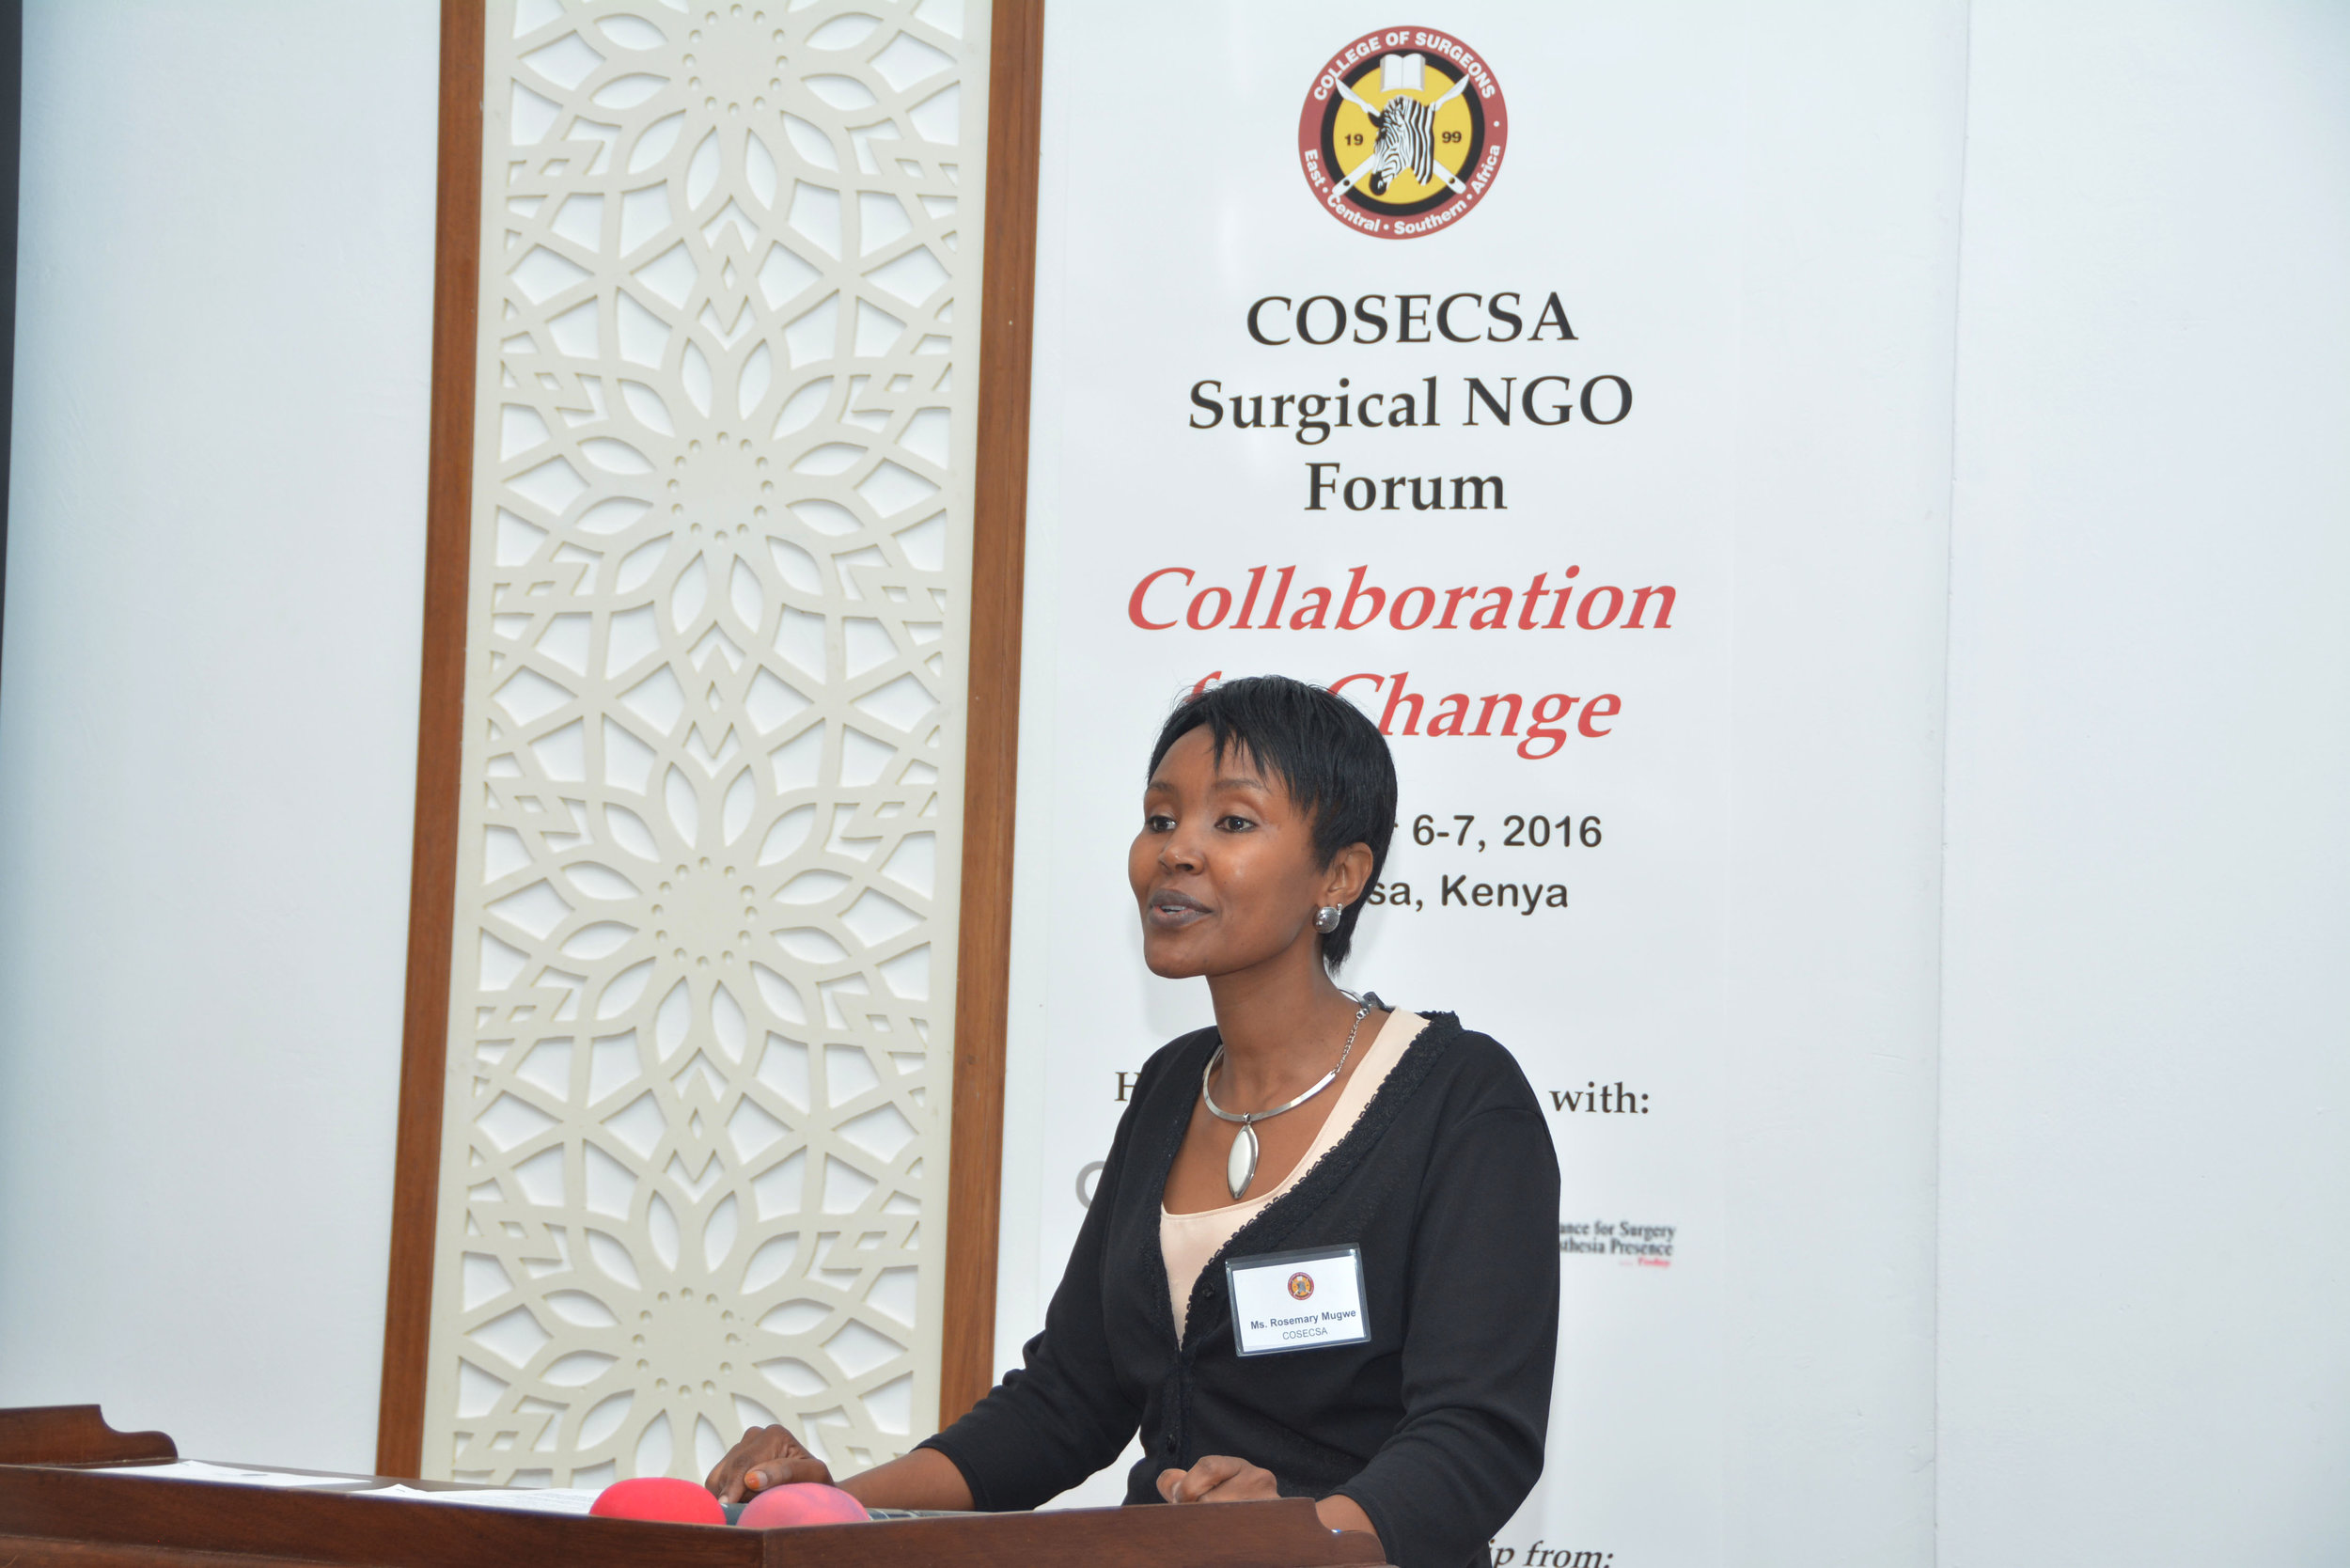 Ms. Rosemary Mugwe - CEO, COSECSA   COSECSA sNGO Forum, Mombasa, Kenya, 2016; Photography by: KEN